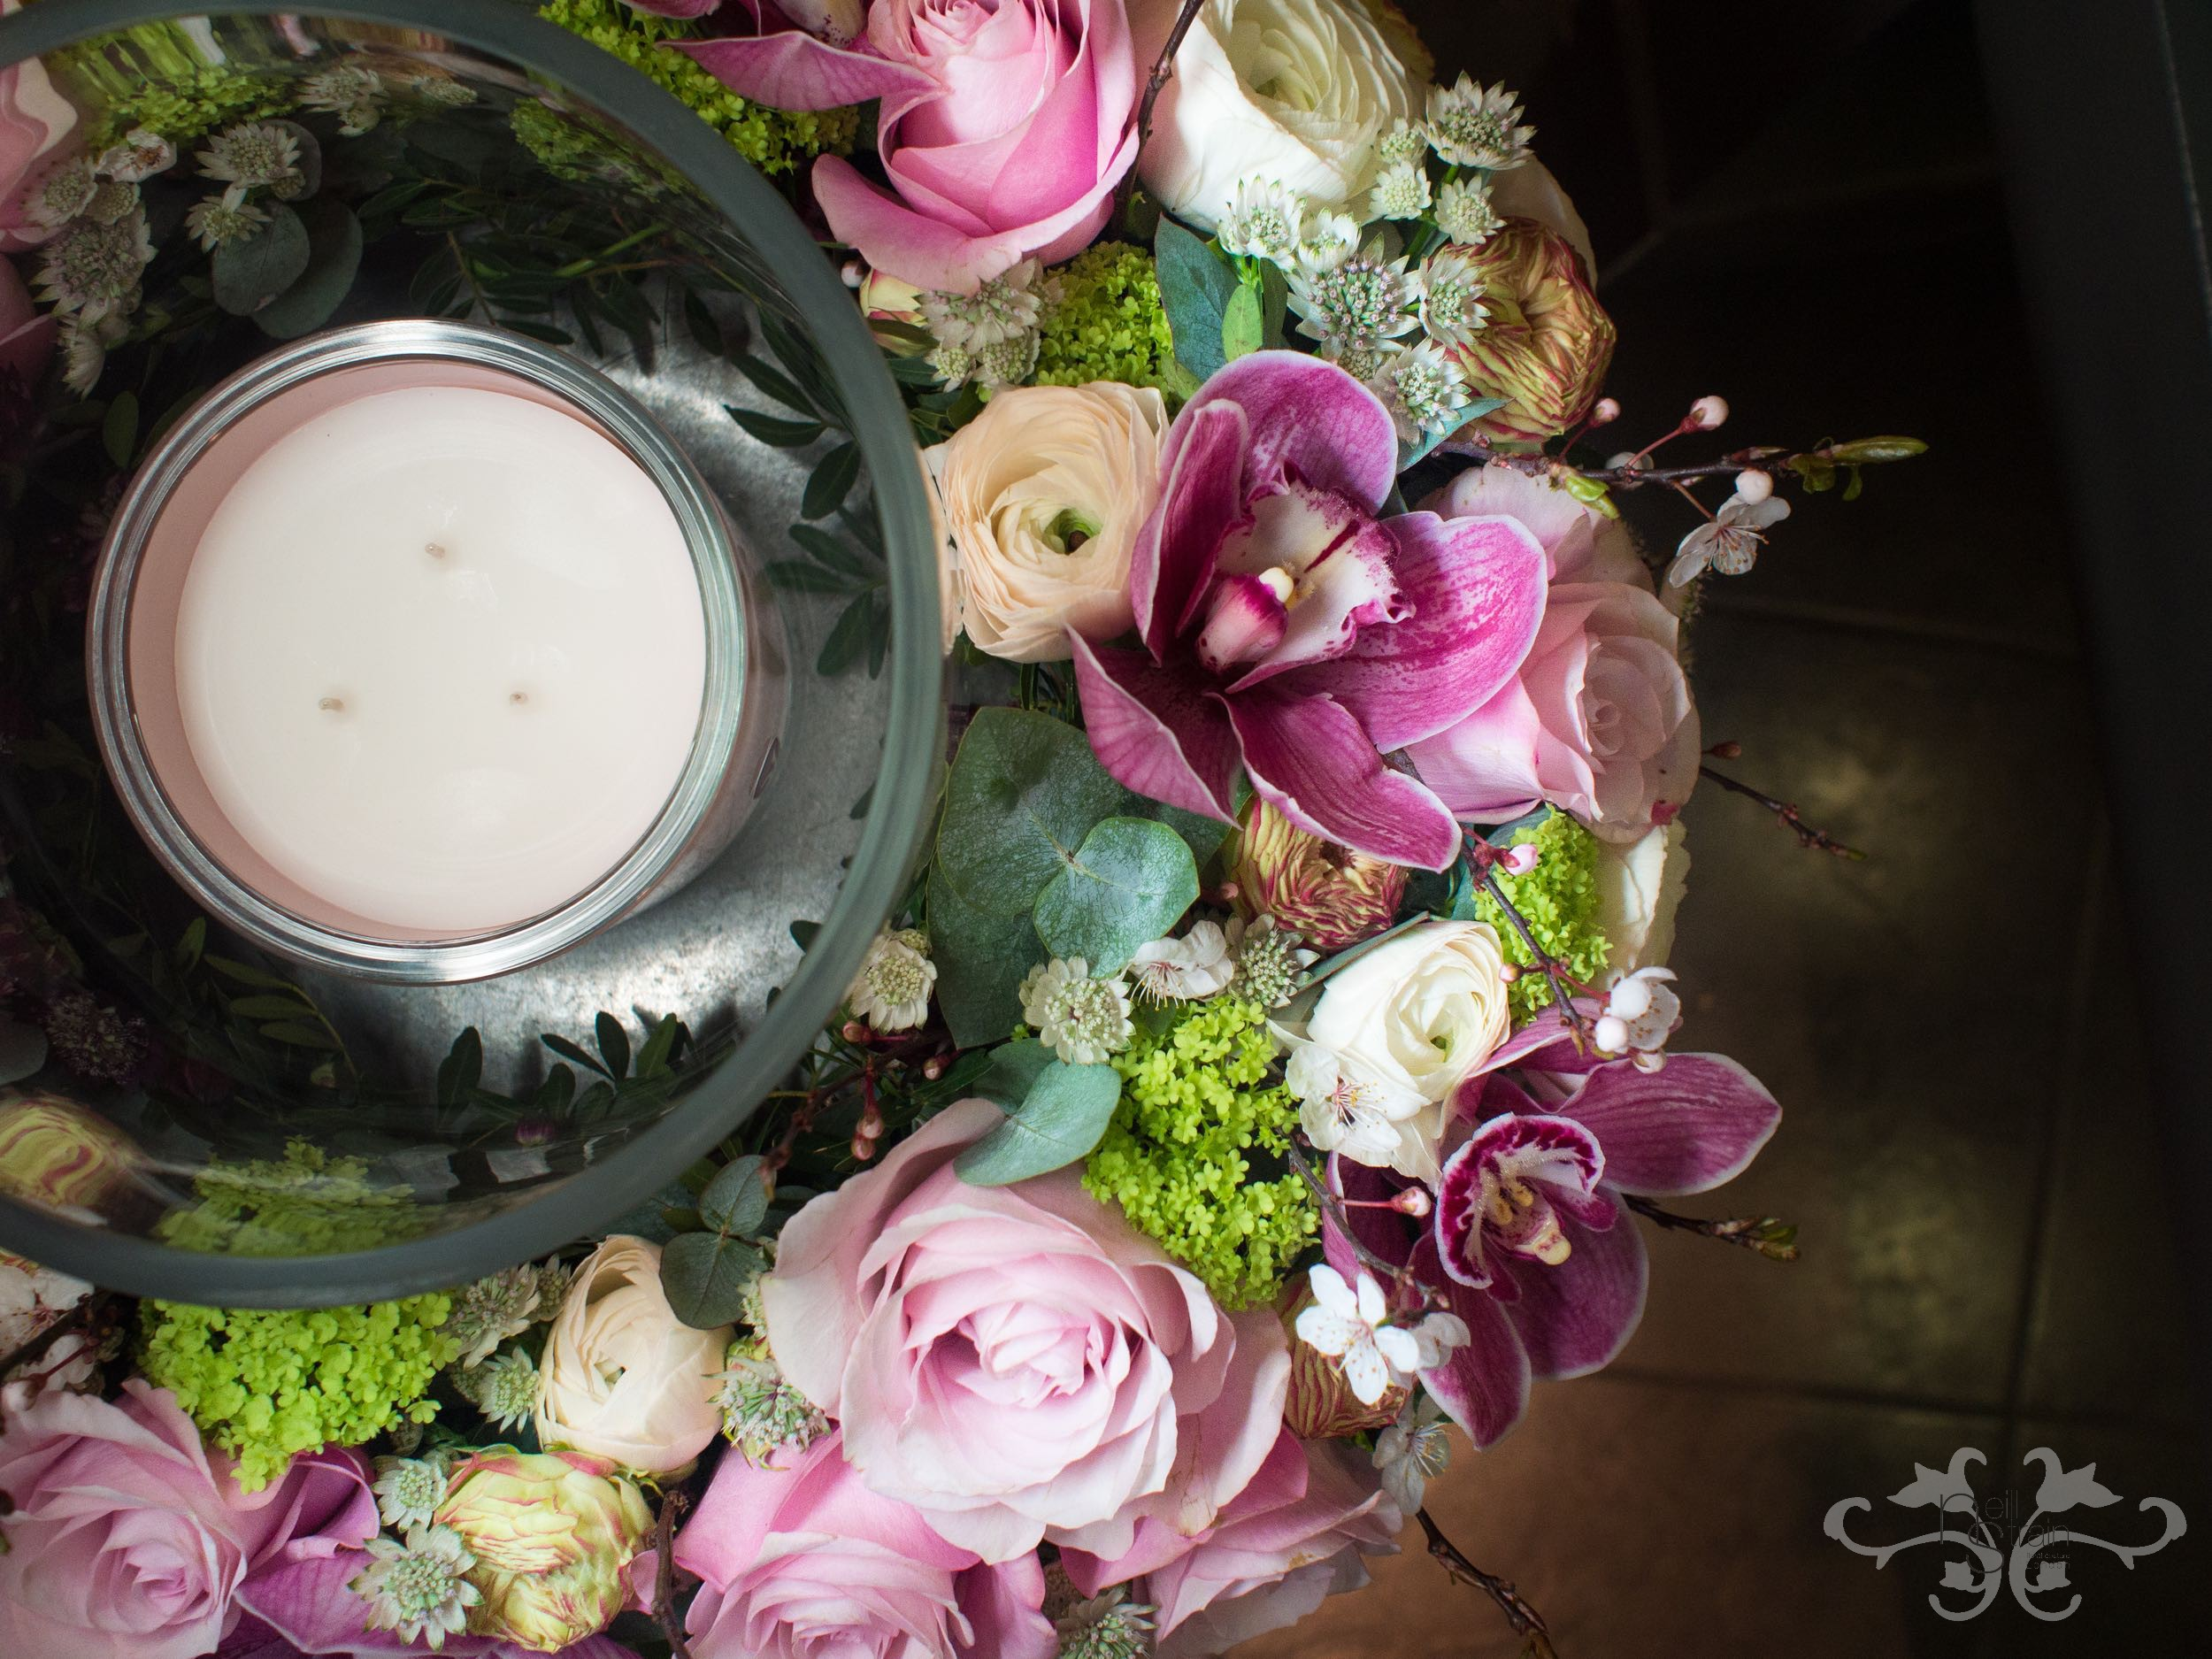 Neill Strain floral wreath cradles a Rachel Vosper luxury candle